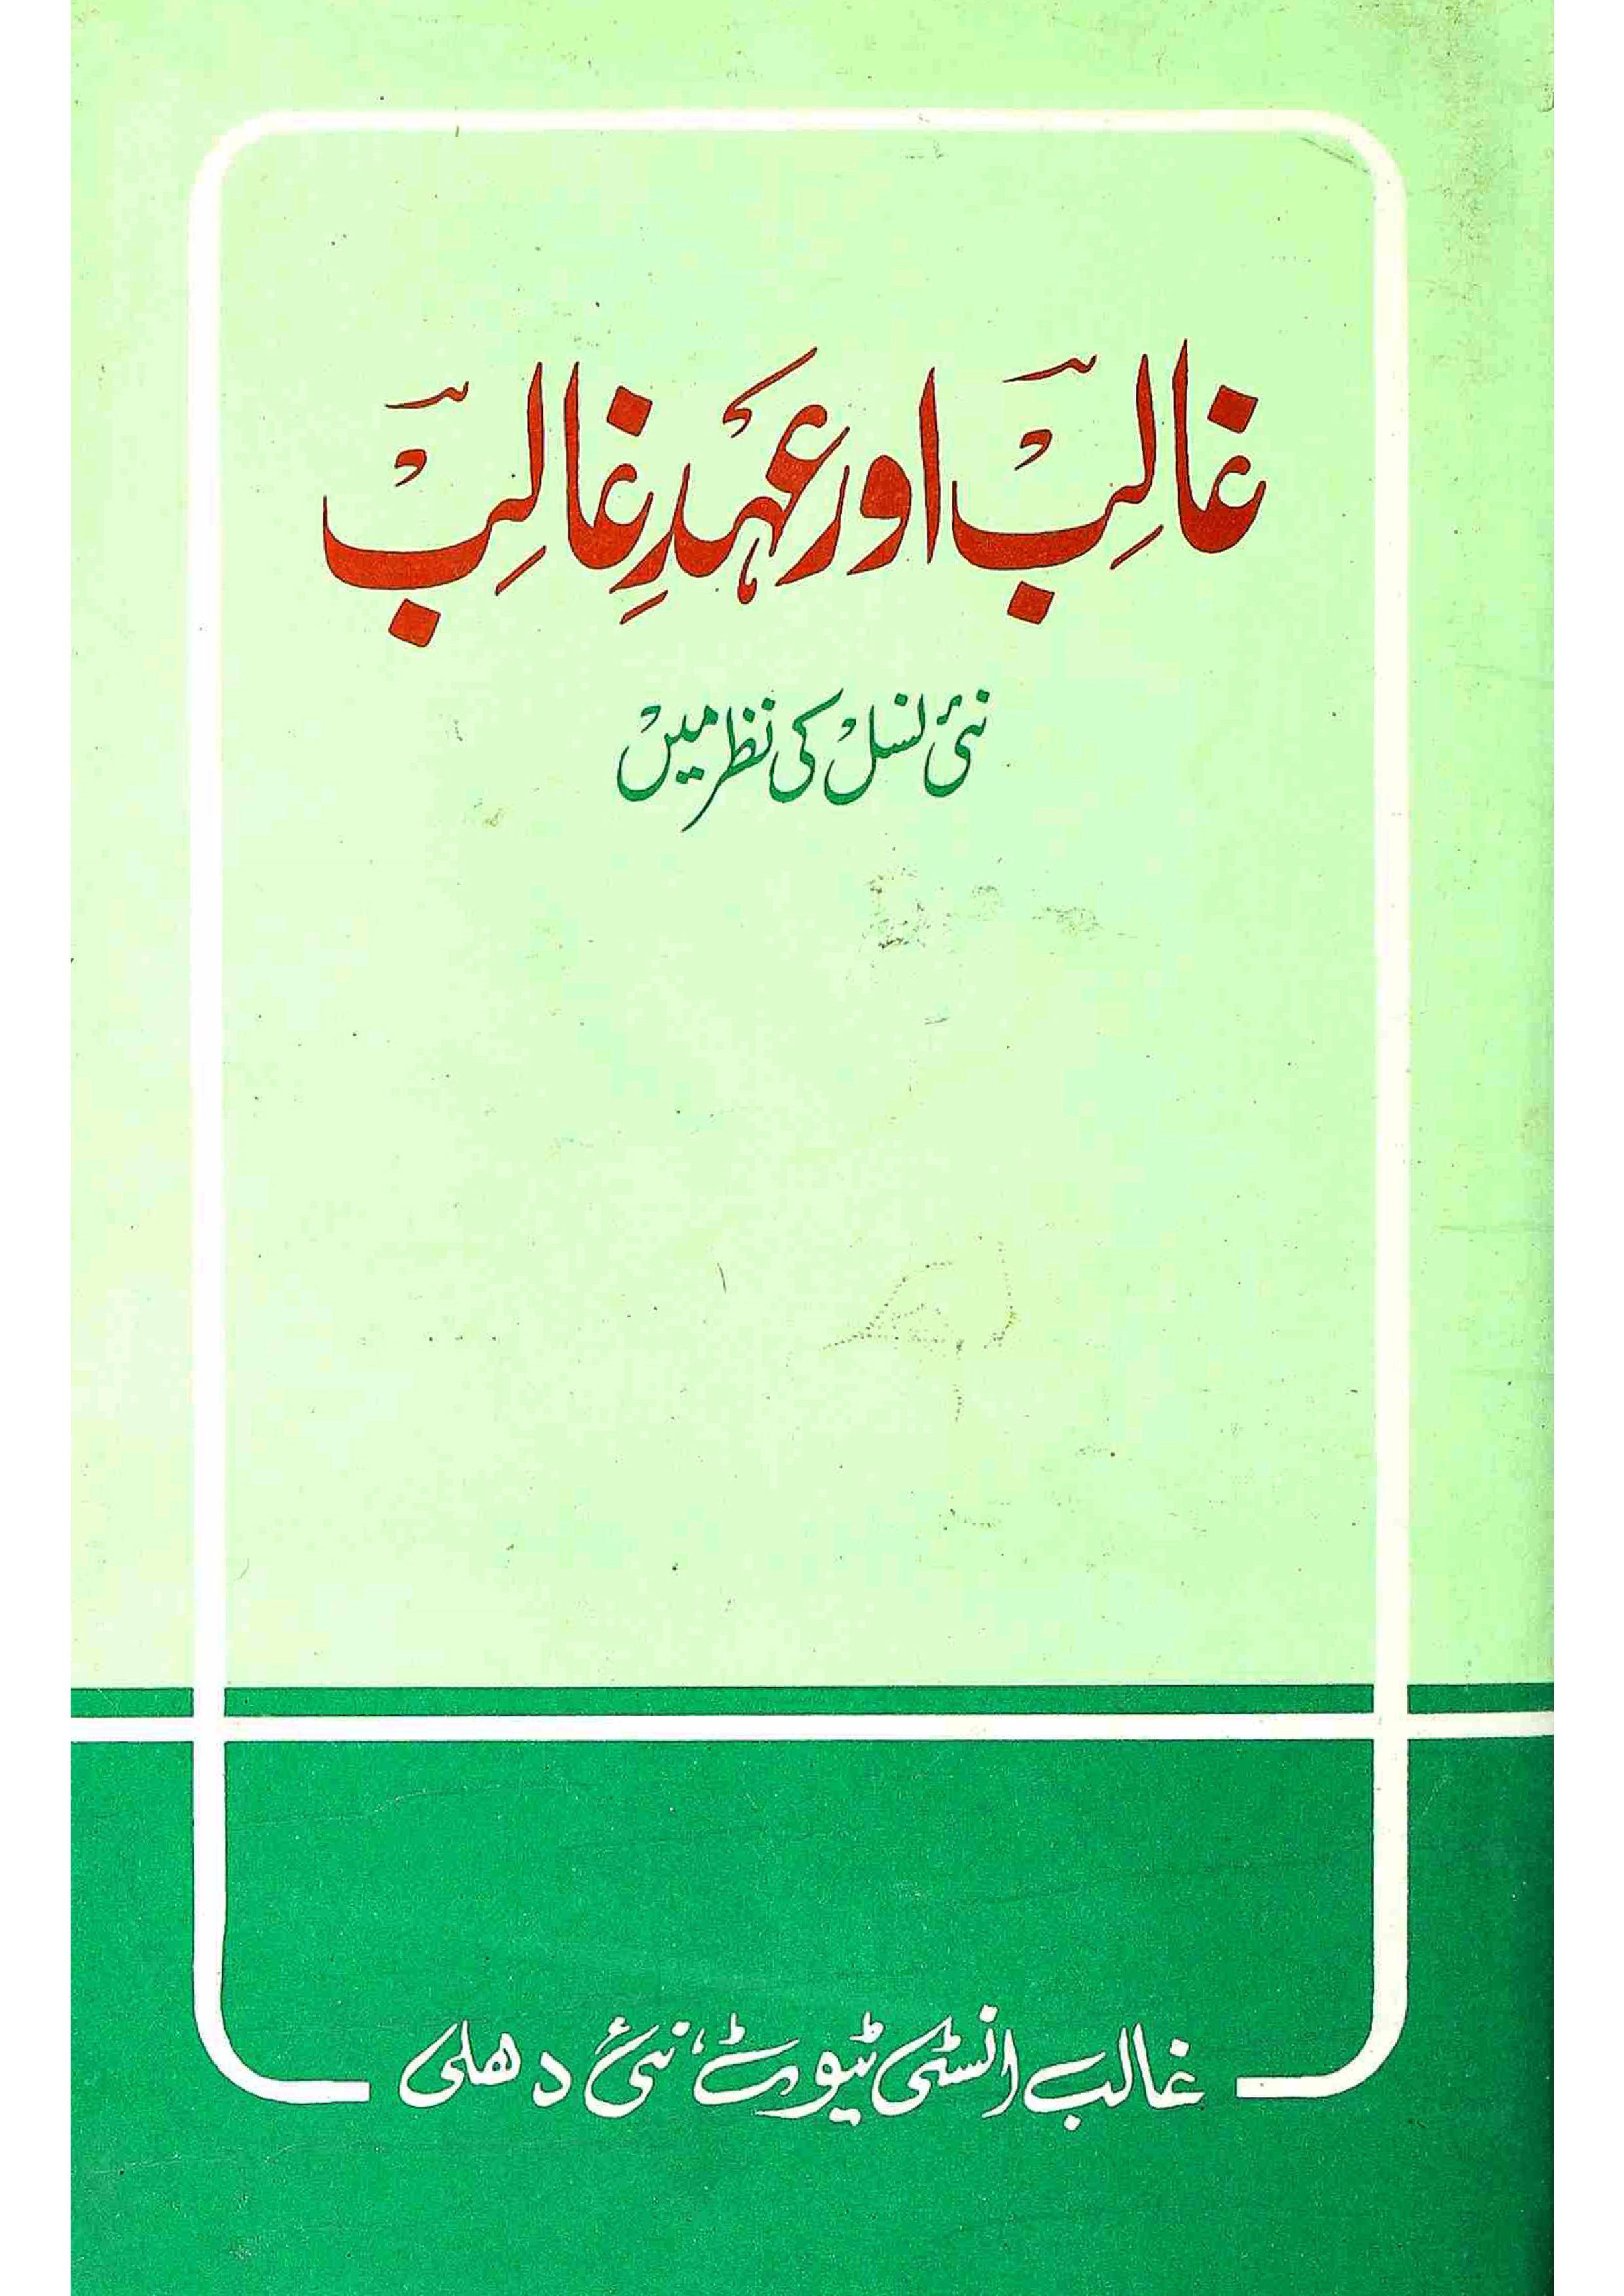 Ghalib Aur Aihd-e-Ghalib     Nai Nasl Ki Nazar Mein